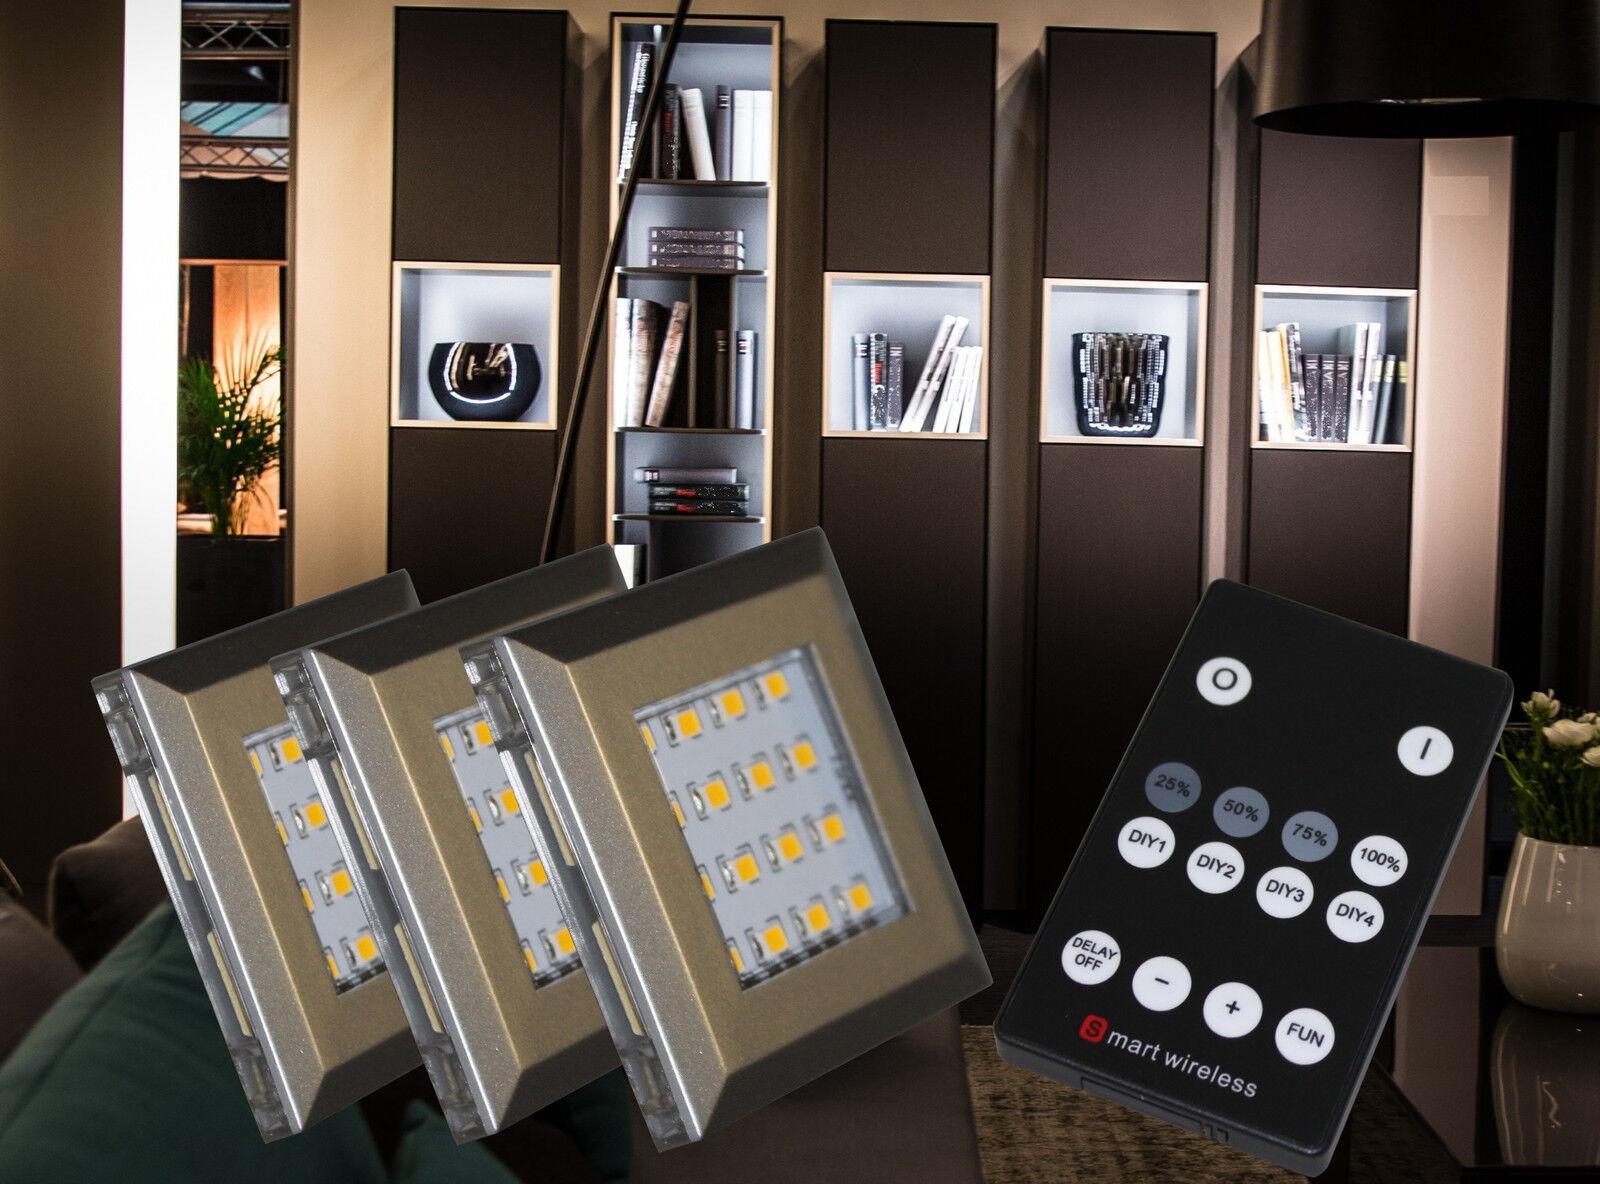 LED Möbel Unterbau Leuchte Fernbedienung Dimmbar Helitec Set Mod.2115-16 4154möb